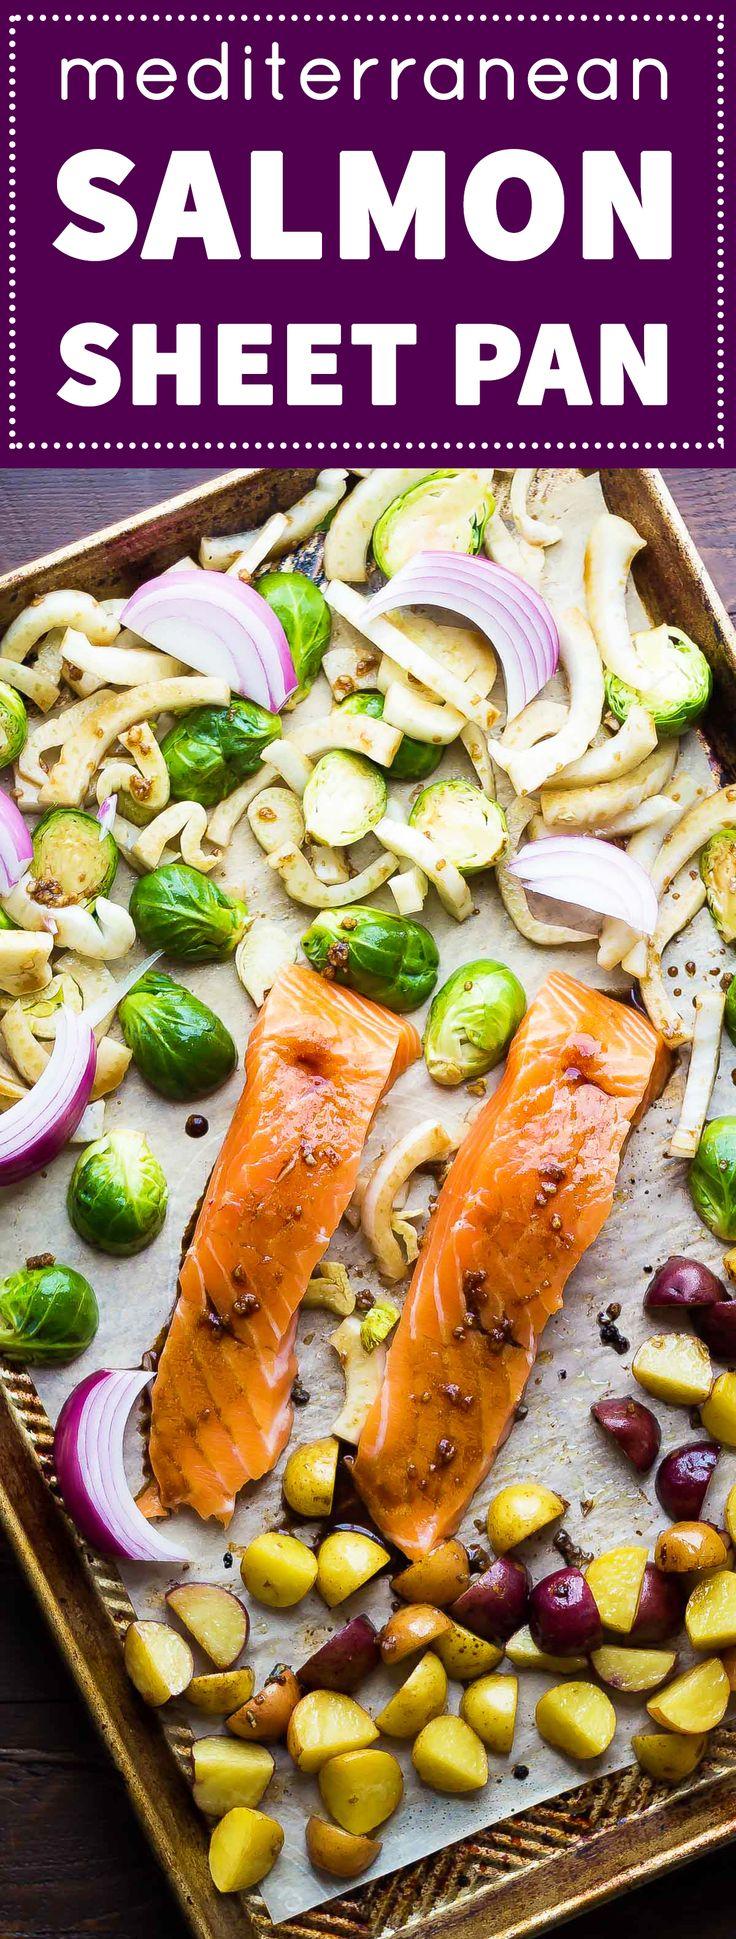 This Mediterranean Salmon Sheet Pan Dinner is ready in under 30 minutes!